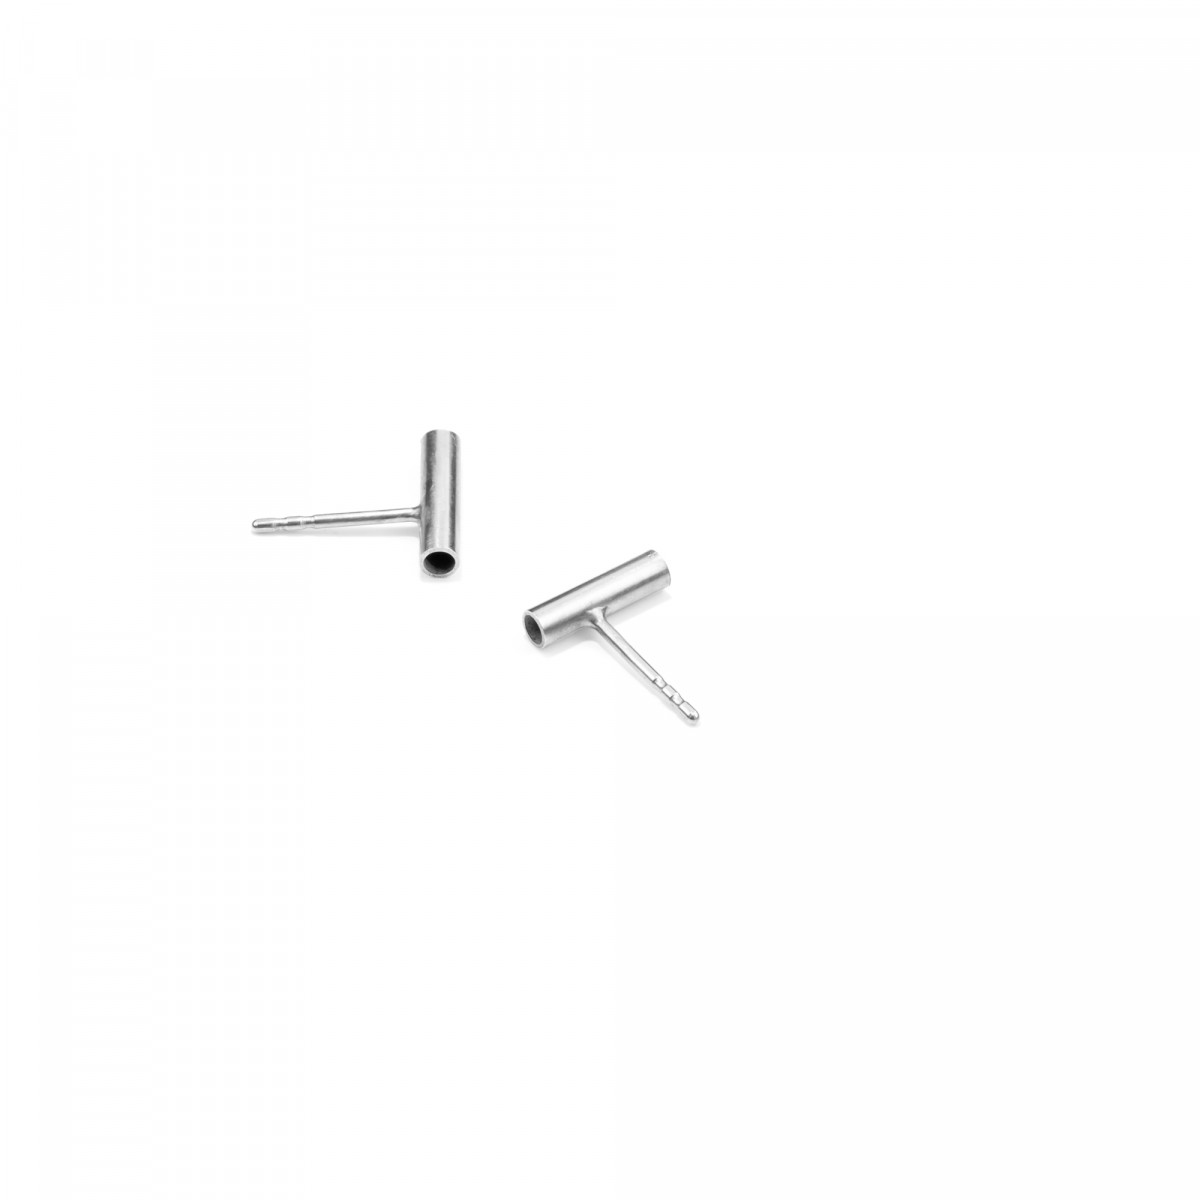 Stecker PROFILE, Silber 925, Jonathan Radetz Jewellery, Sterlingsilber, Länge 10 mm, Handmade in Germany